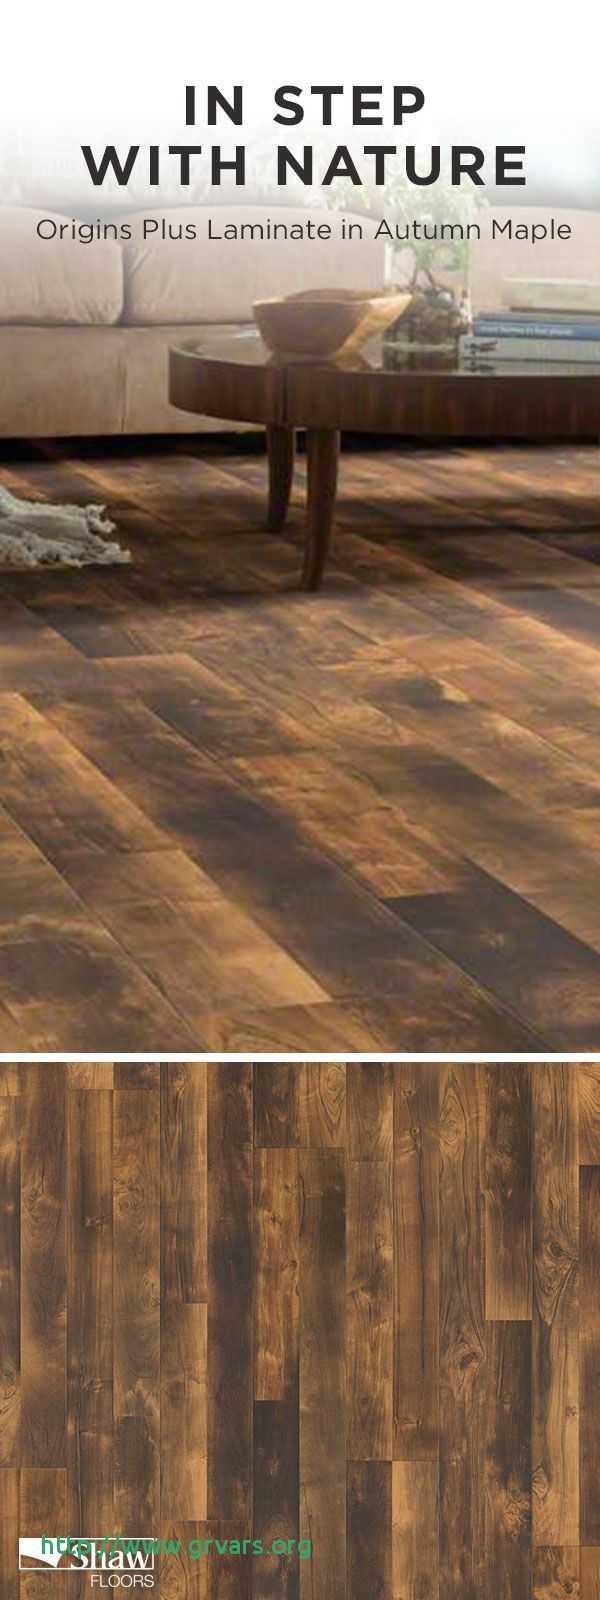 mohawk hardwood flooring oak cherry of simple floors inc beau our favorite wood look tile dream home with simple floors inc luxe 20 best mohawk flooring images on pinterest